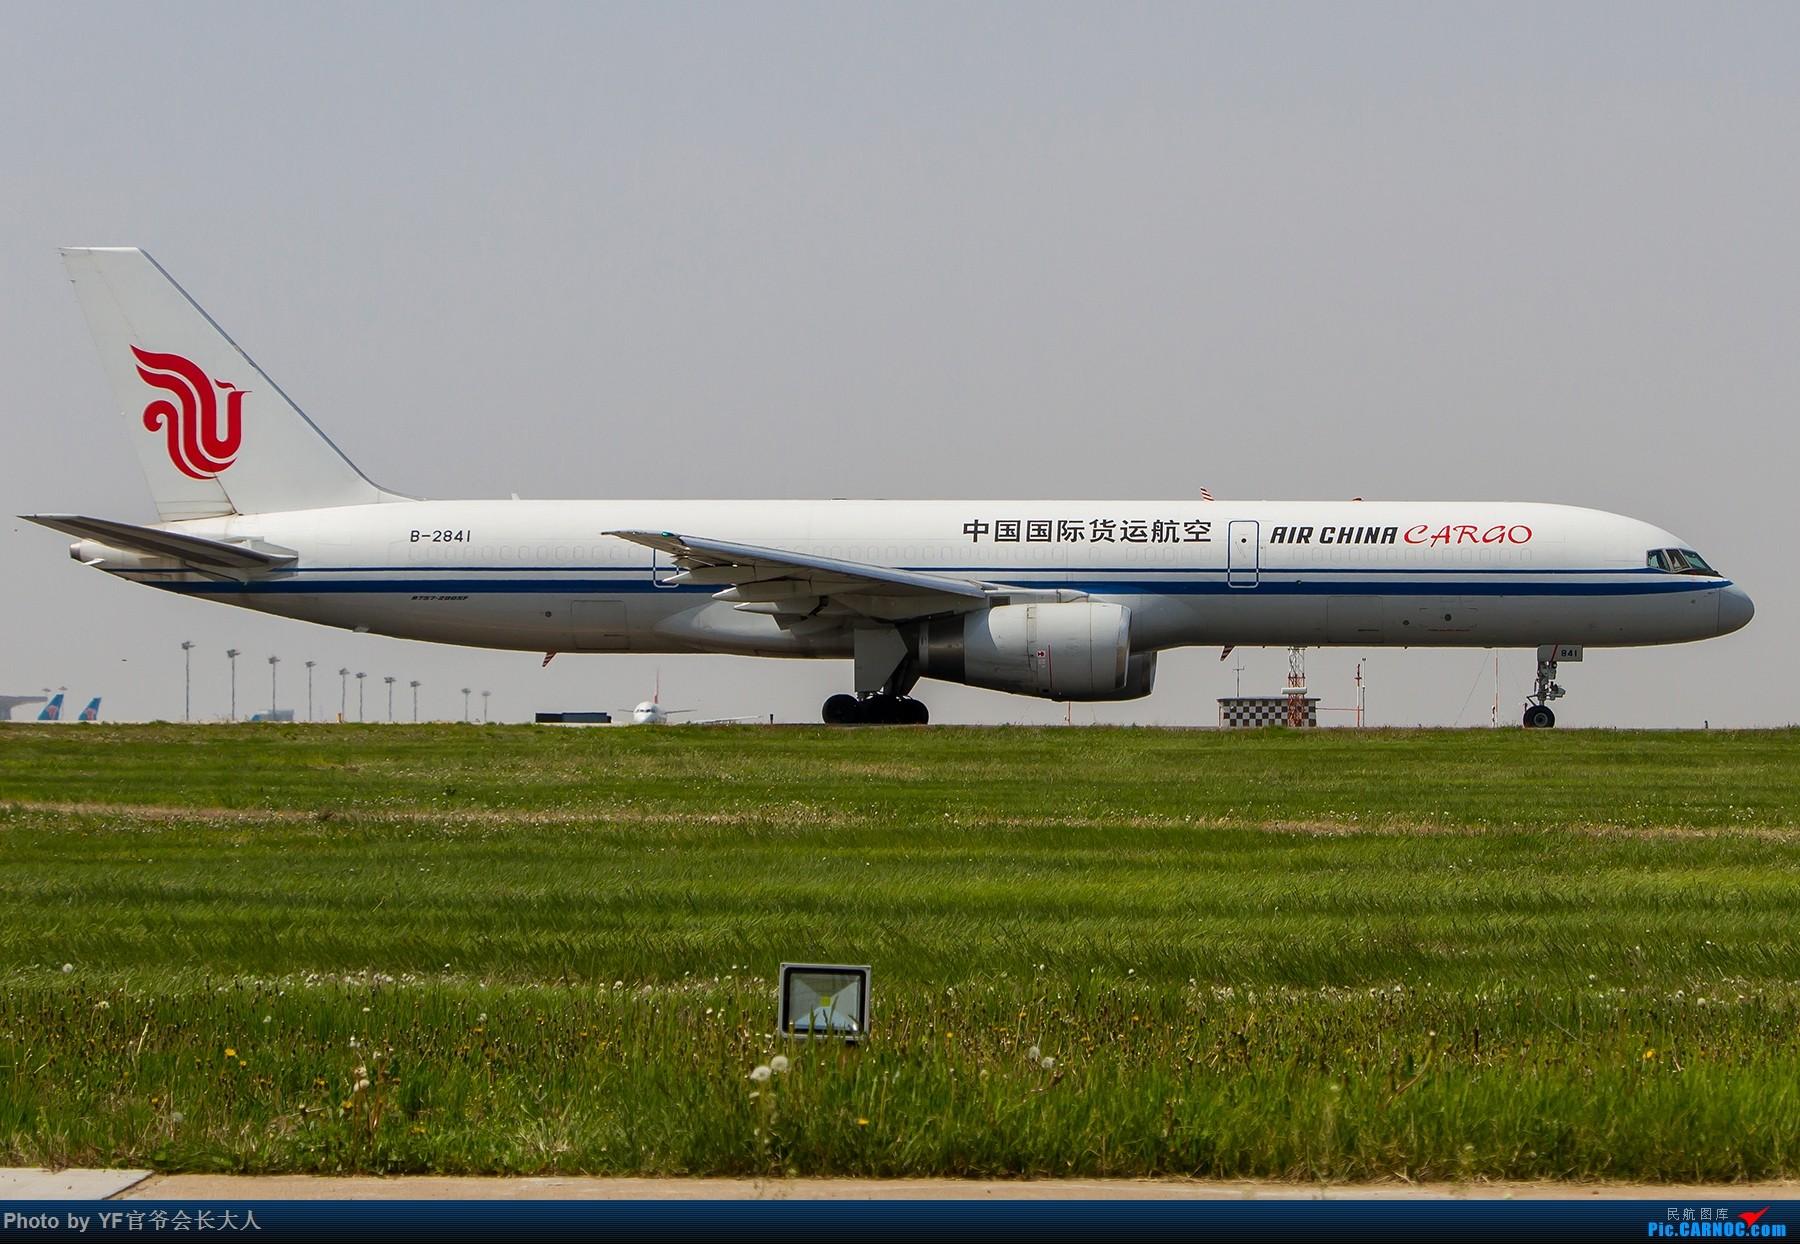 Re:[原创]【ZYTX】轻易不拍机,拍就要拍个过瘾!(新开的酷鸟,亚洲大西洋,顺带碰上朝韩两国的好货) BOEING 757-200 B-2841 中国沈阳桃仙国际机场